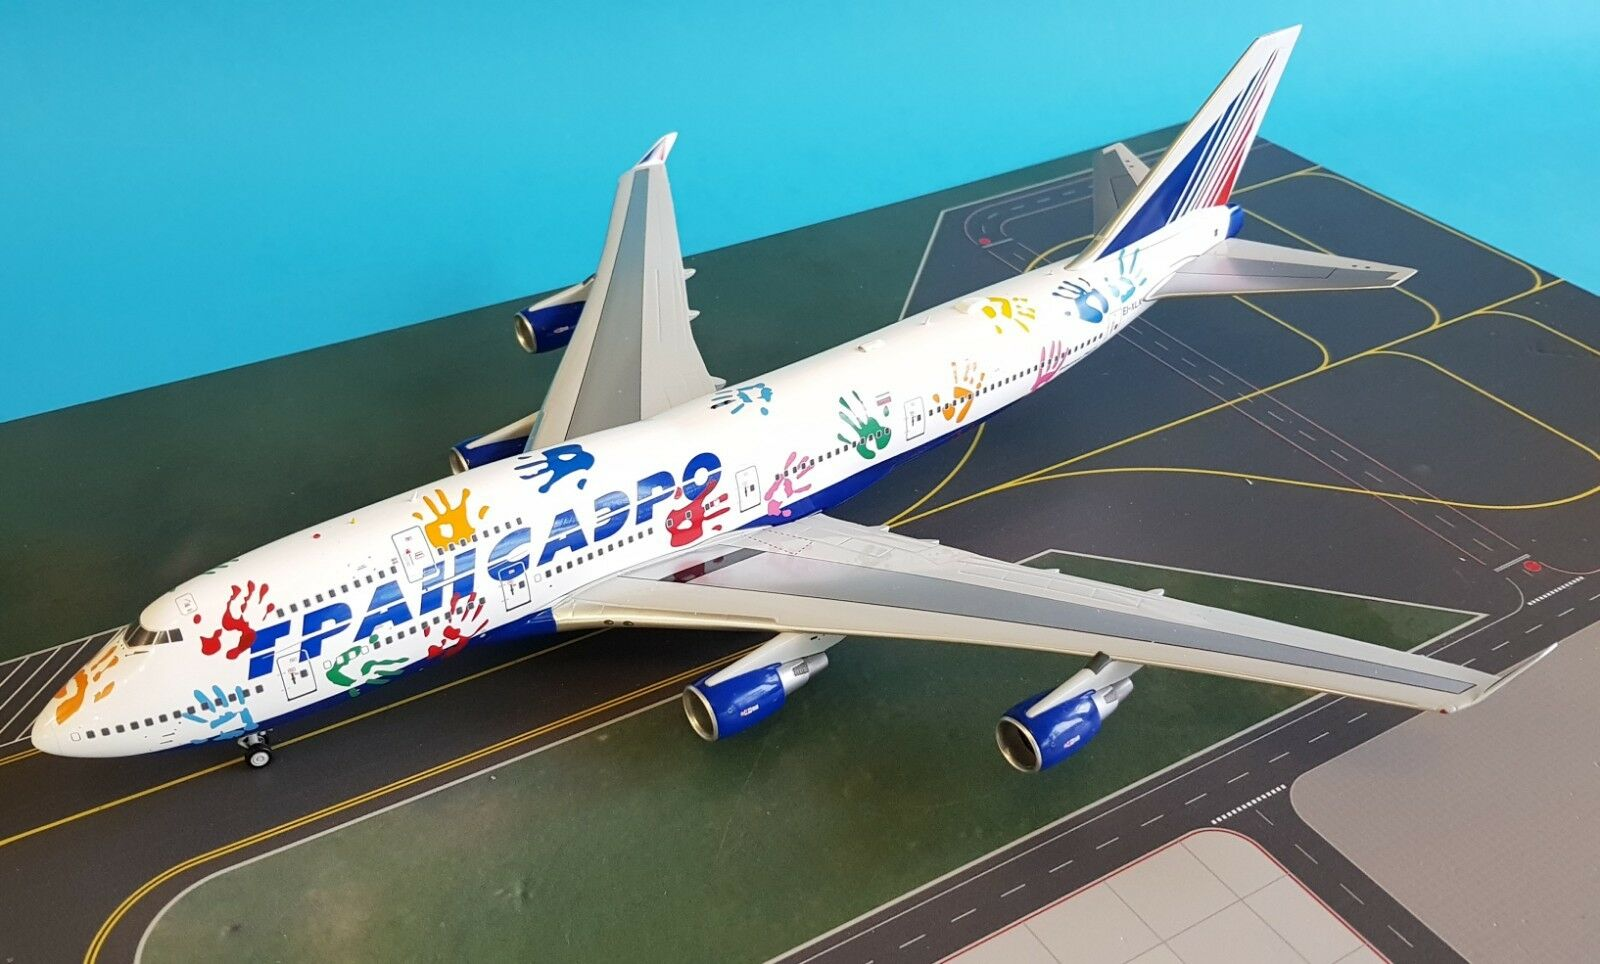 Inflight 200 Boeing 747-400 Transaero EI-XLK 'Flight Of Hope ' (with stand)